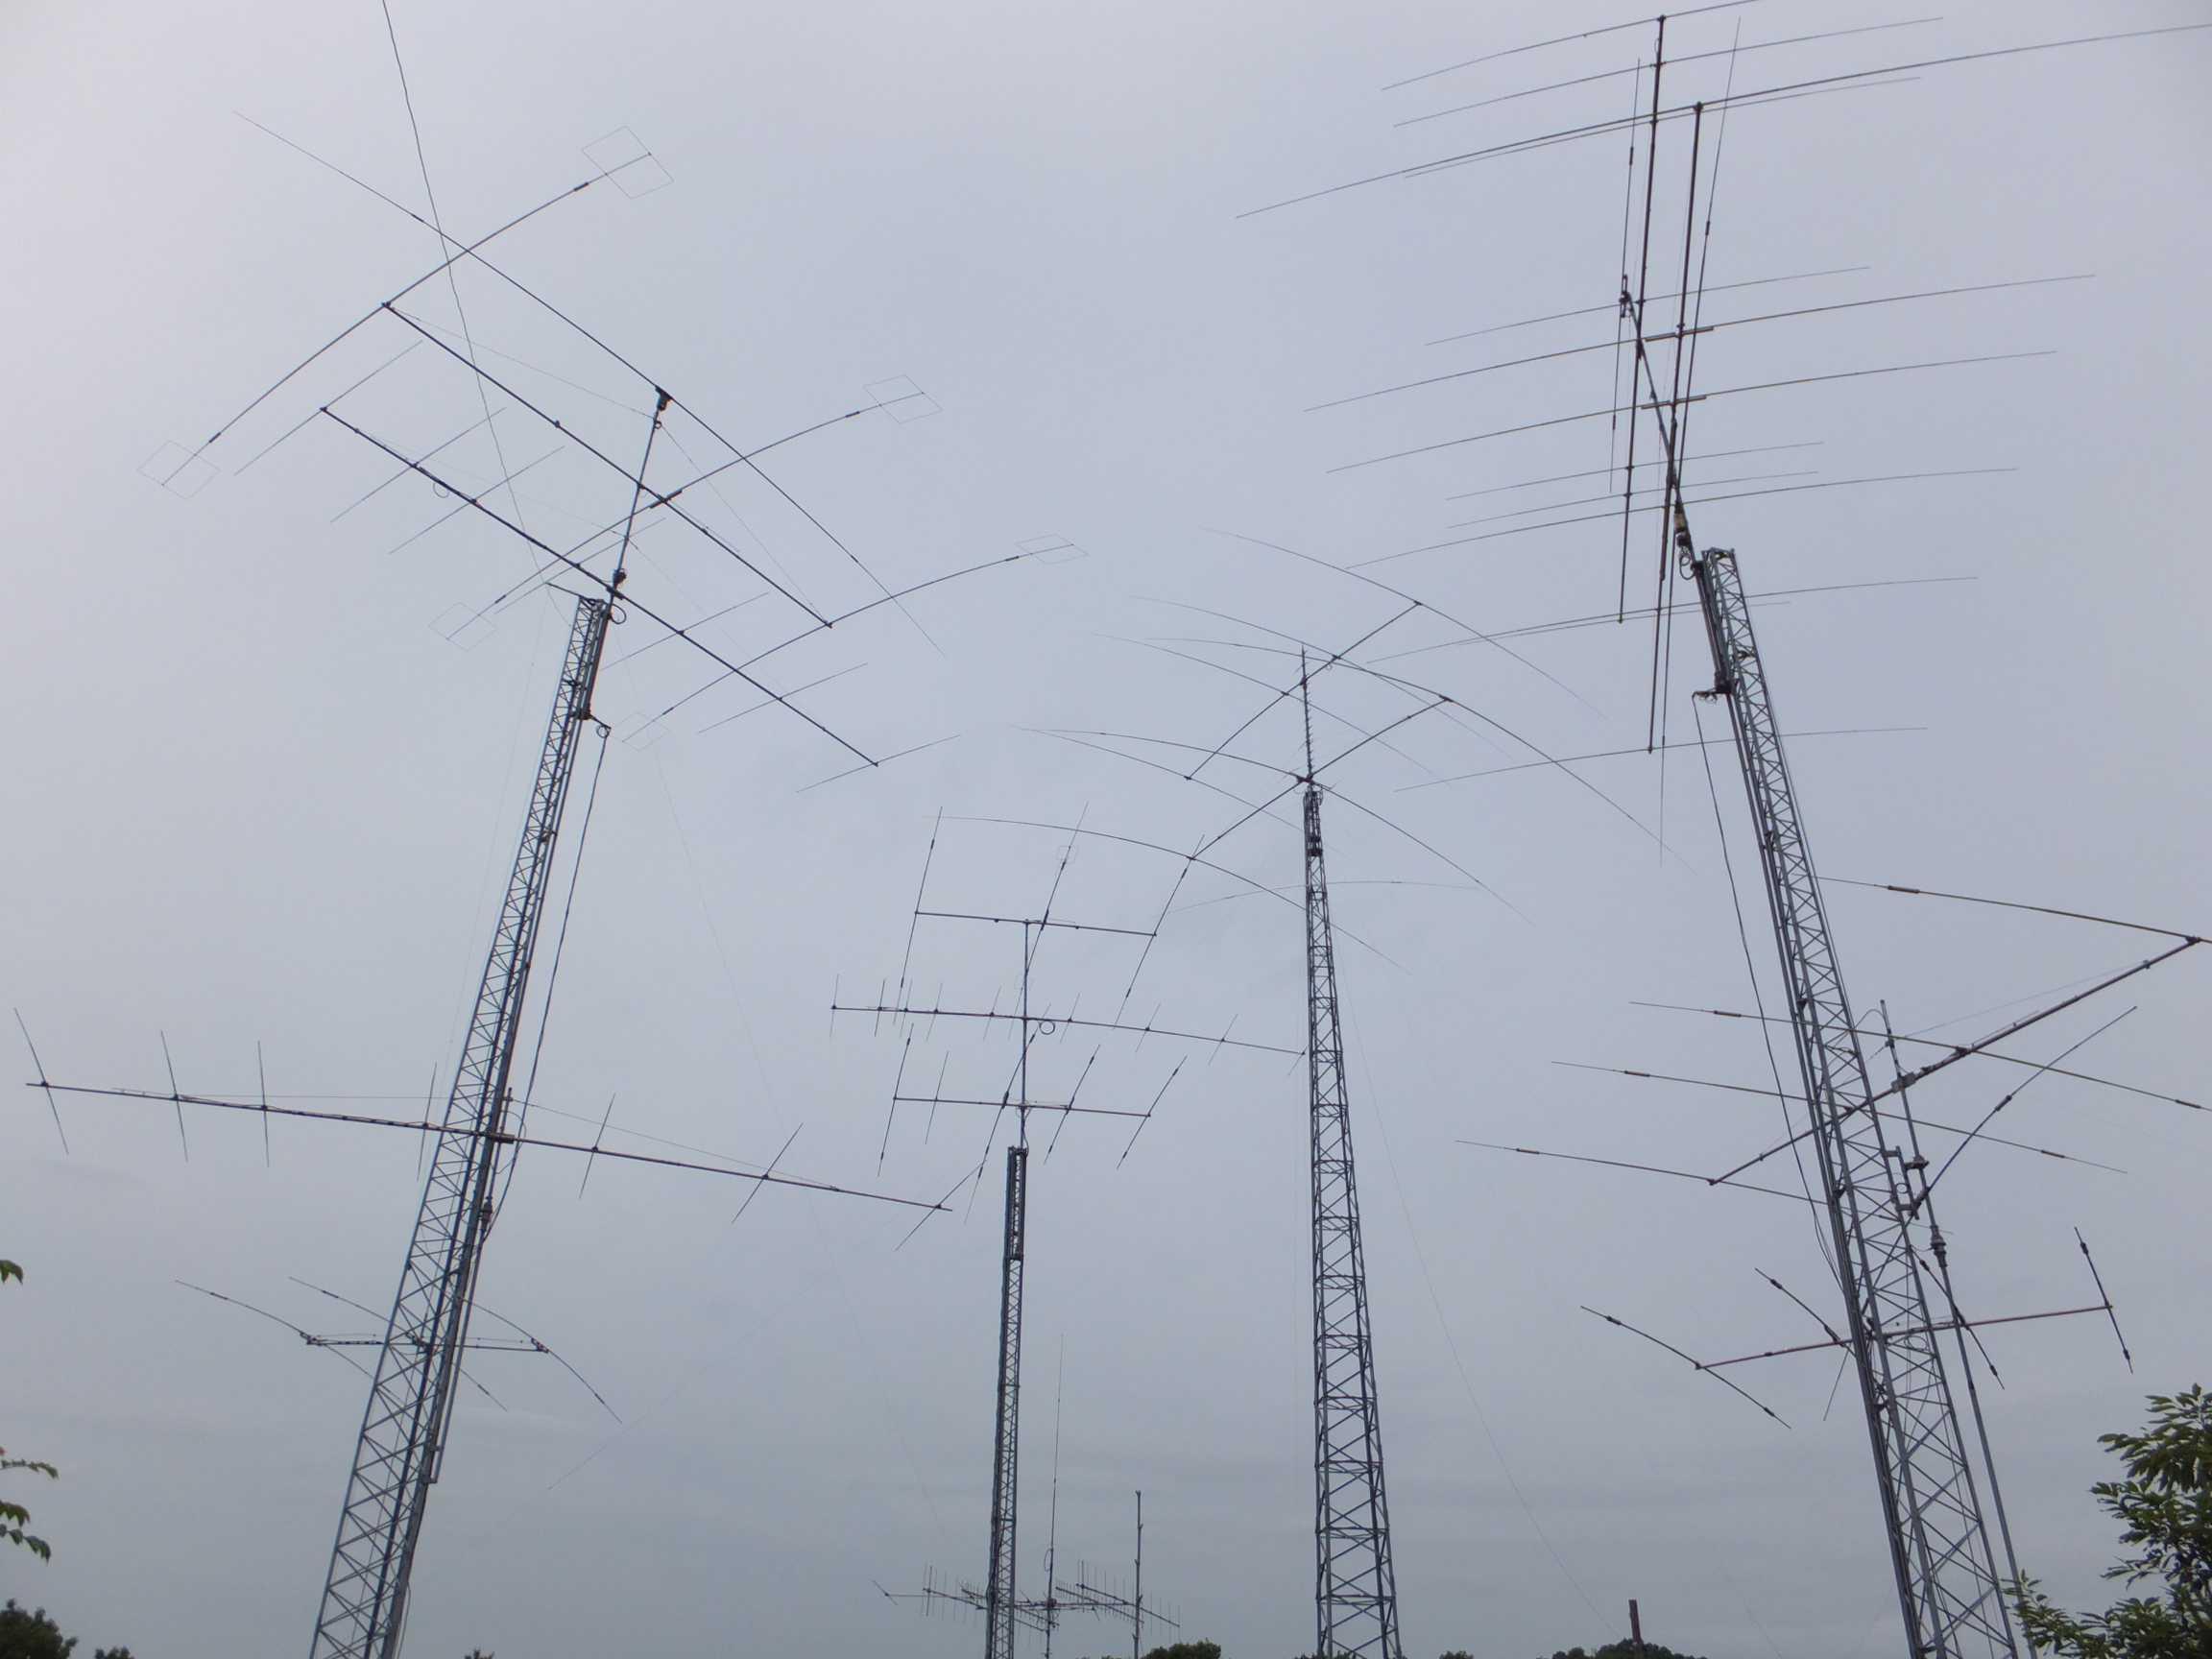 [Antenna Farm]